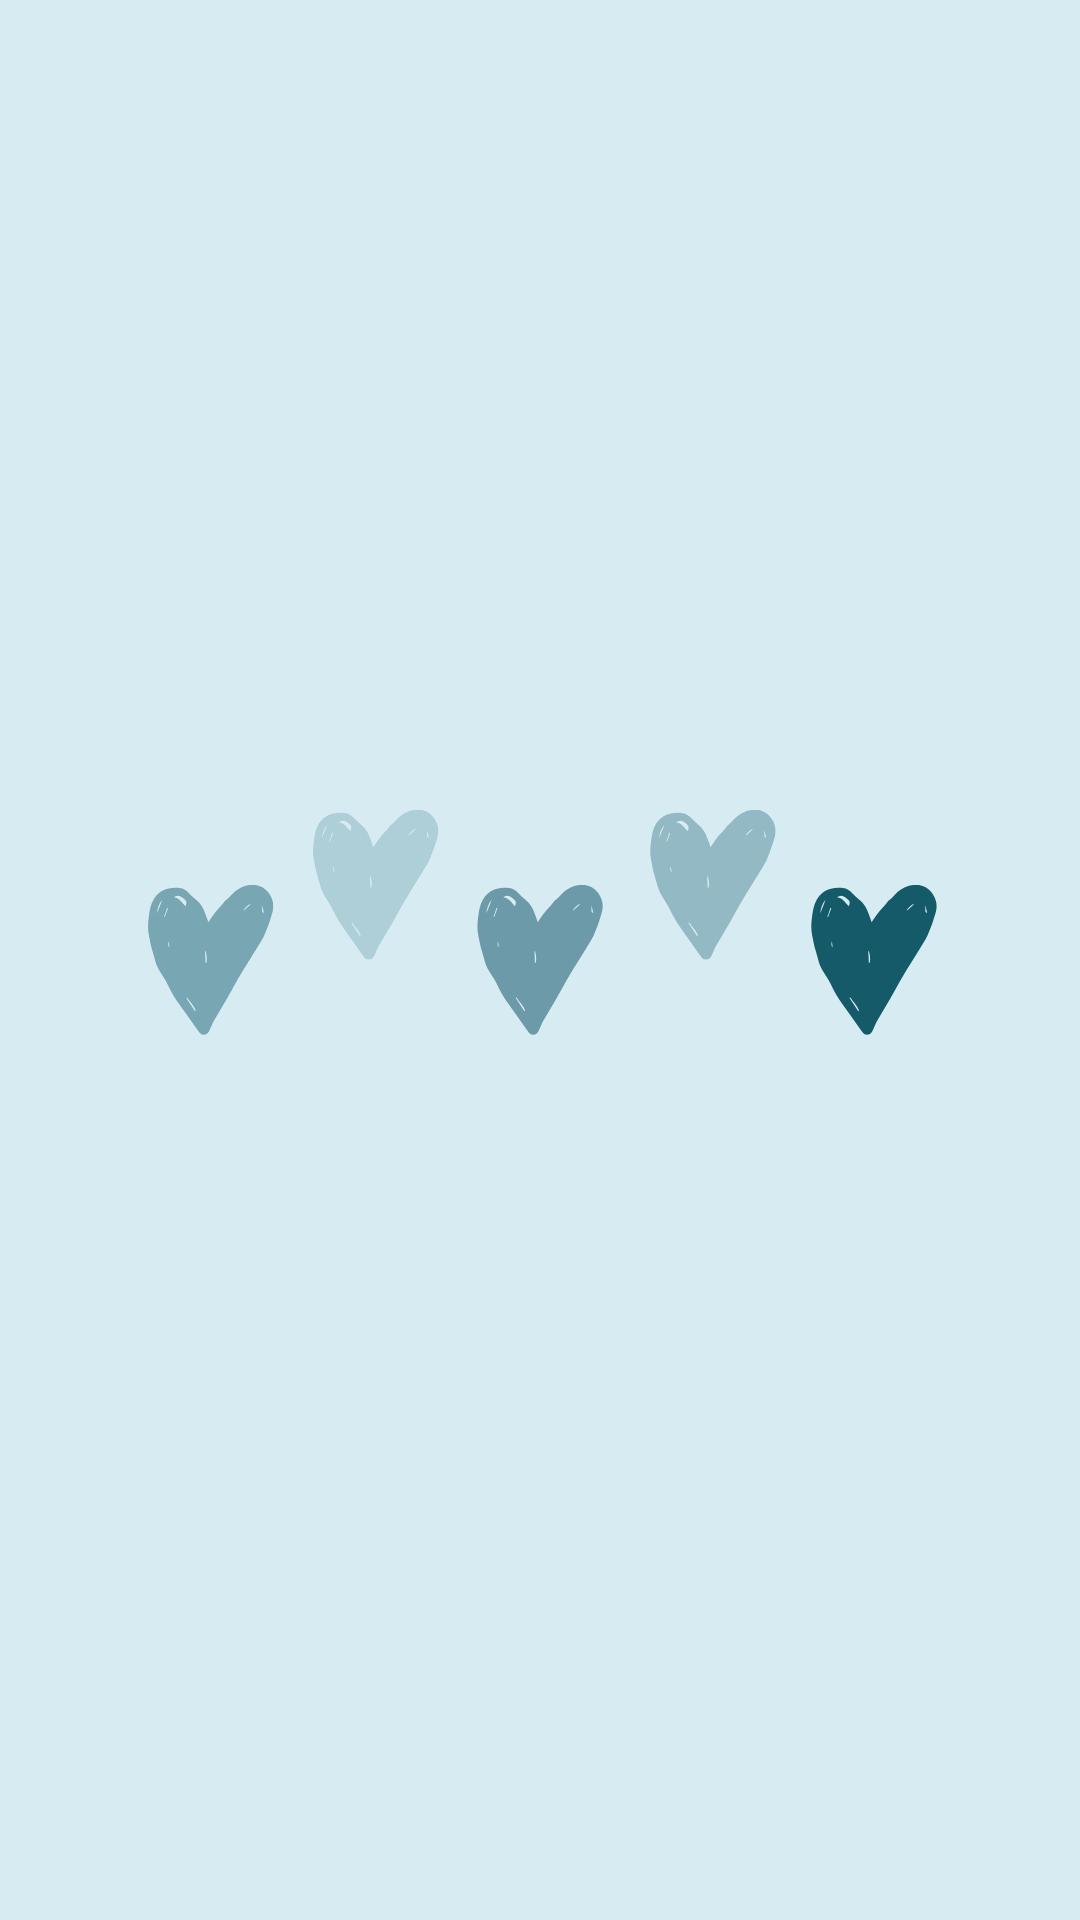 Azul Estetica Del Papel Pintado Iphone Wallpaper Tumblr Aesthetic Blue Wallpaper Iphone Cute Wallpapers